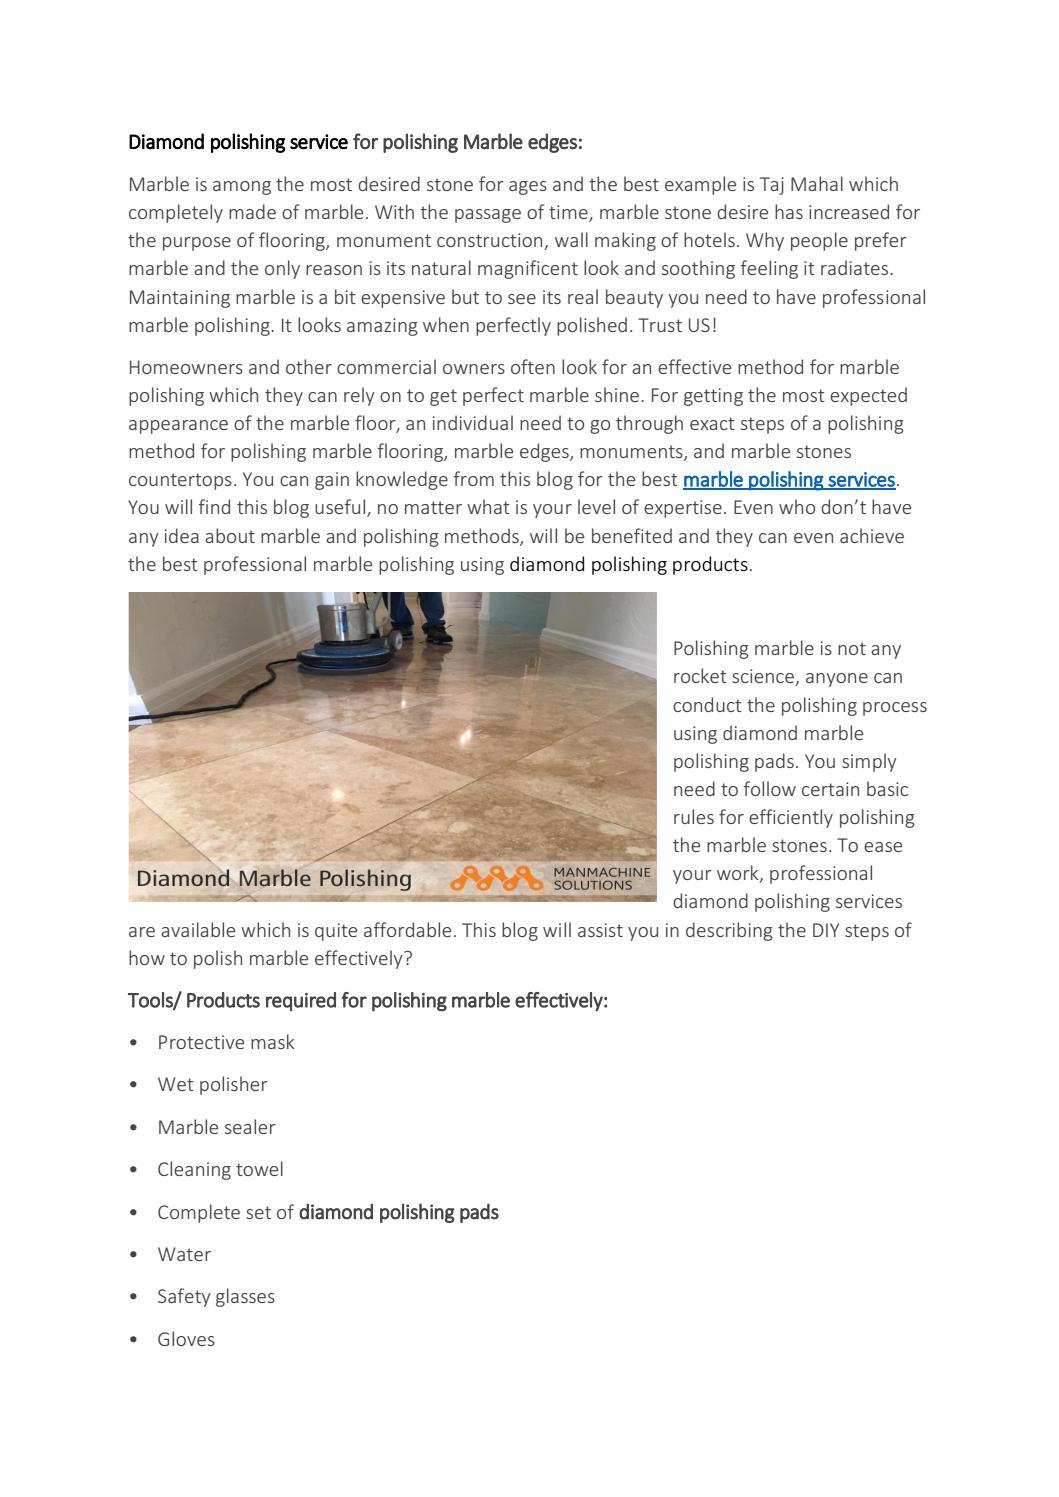 Diamond Polishing Service For Polishing Marble Edges By Manmachine